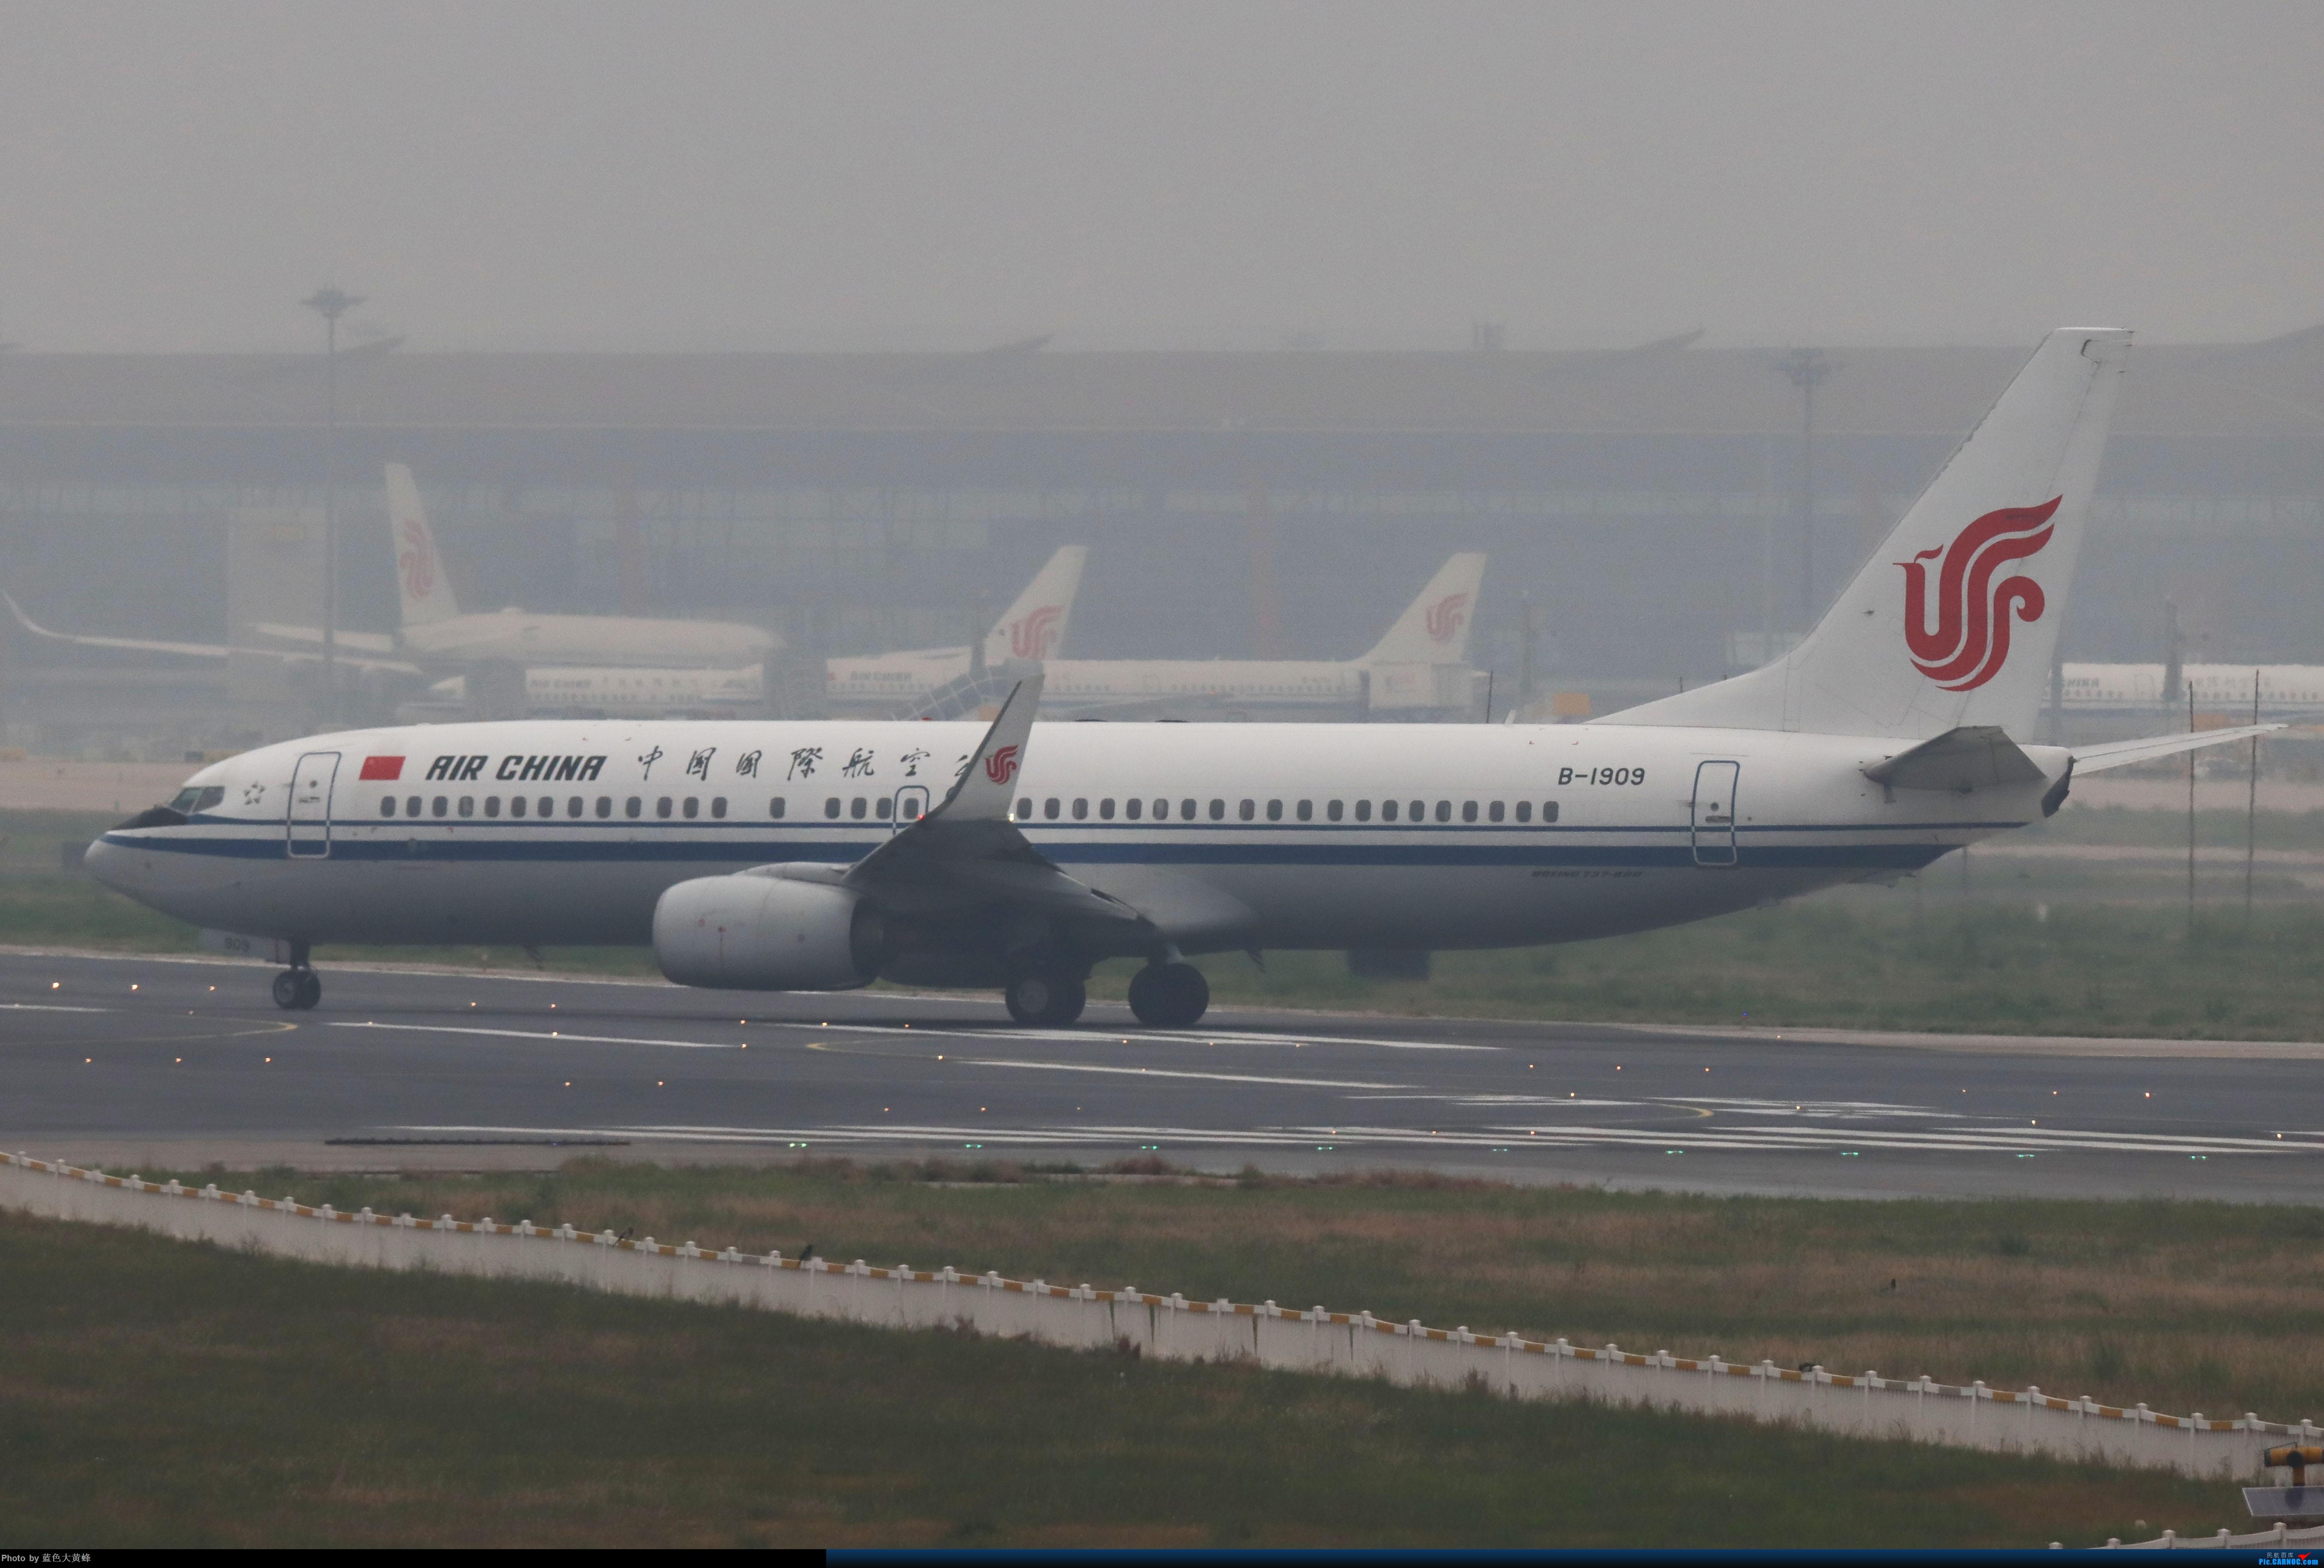 Re:[原创]烂天废片(持续更新) BOEING 737-800 B-1909 中国北京首都国际机场